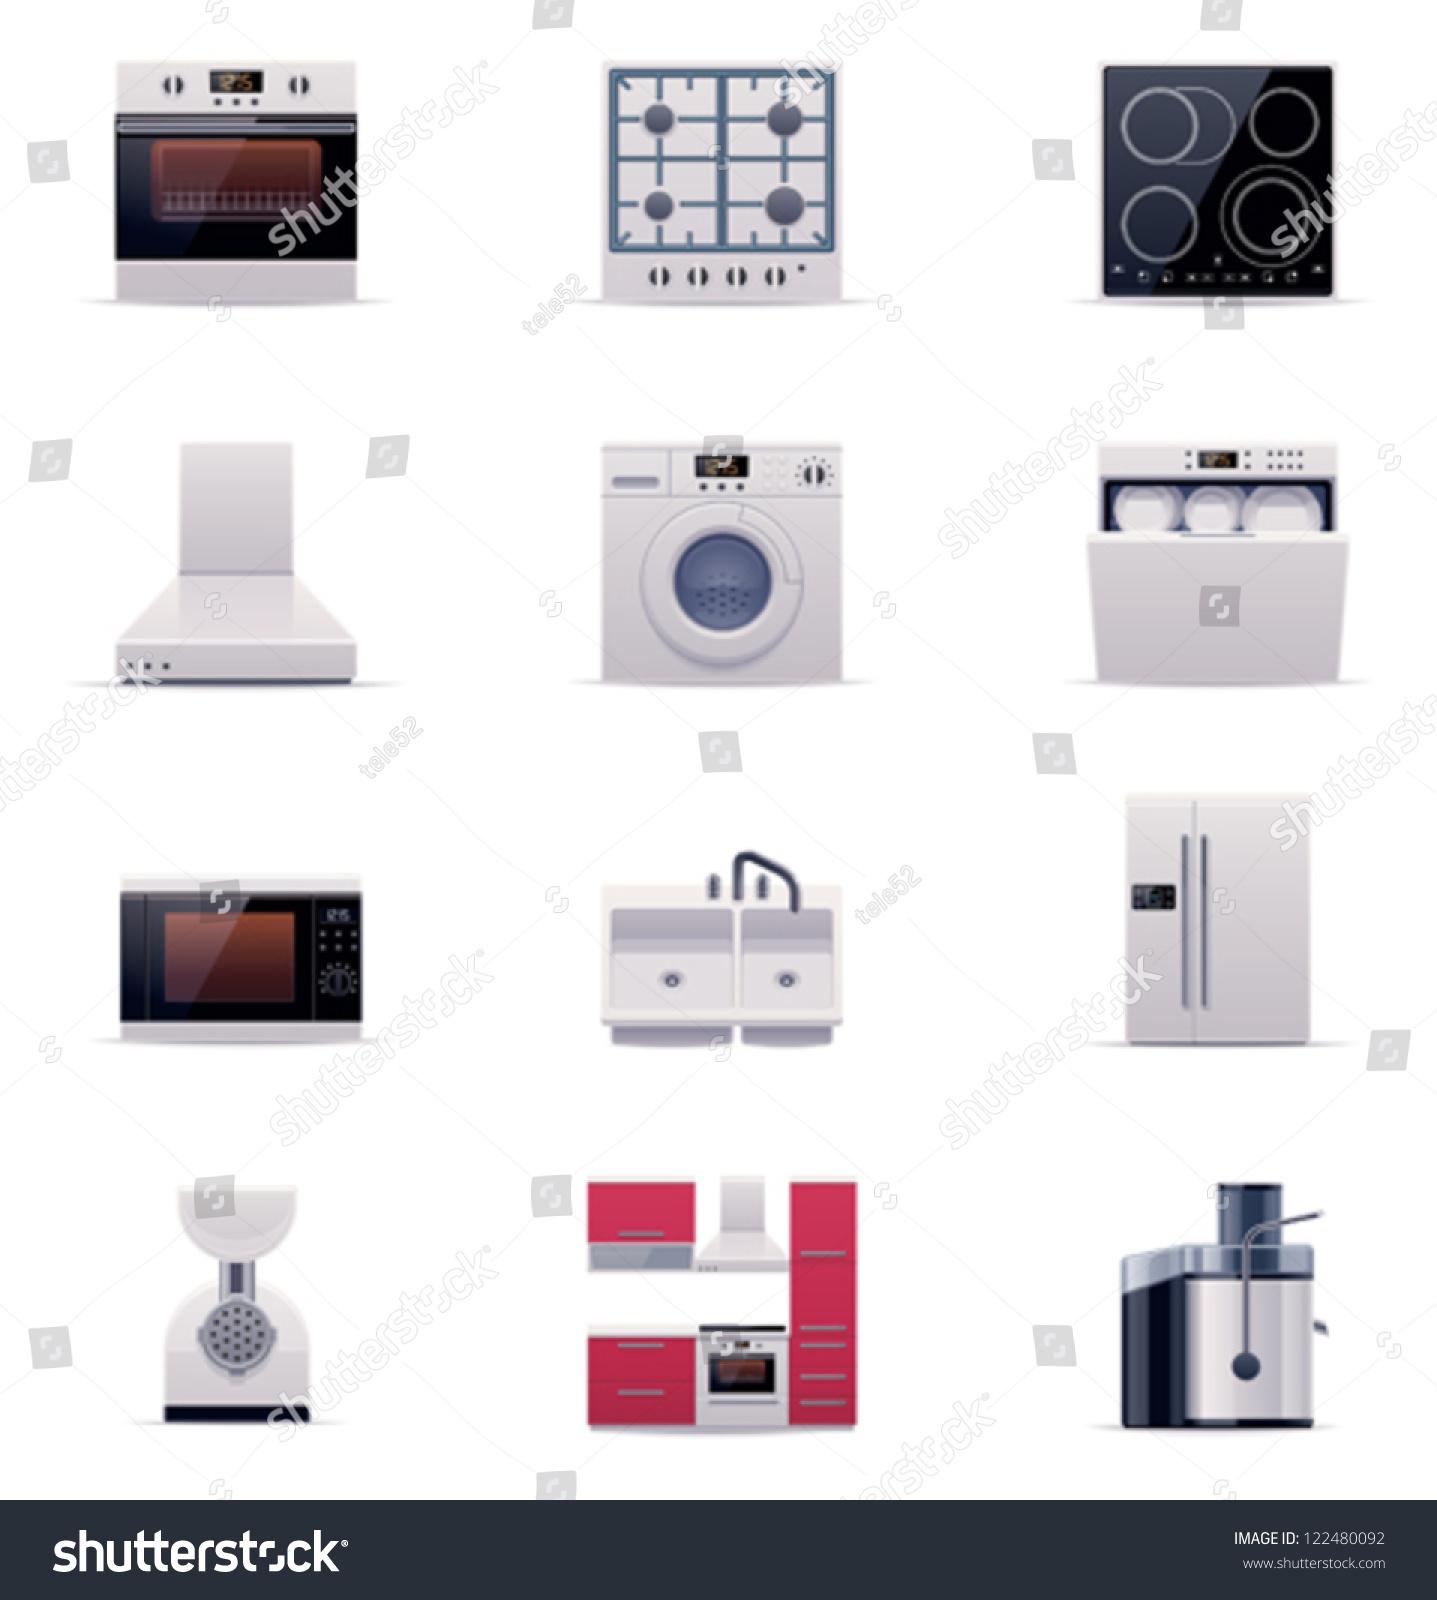 Domestic Kitchen Appliances Vector Domestic Kitchen Appliances And Electronics Icon Set Part